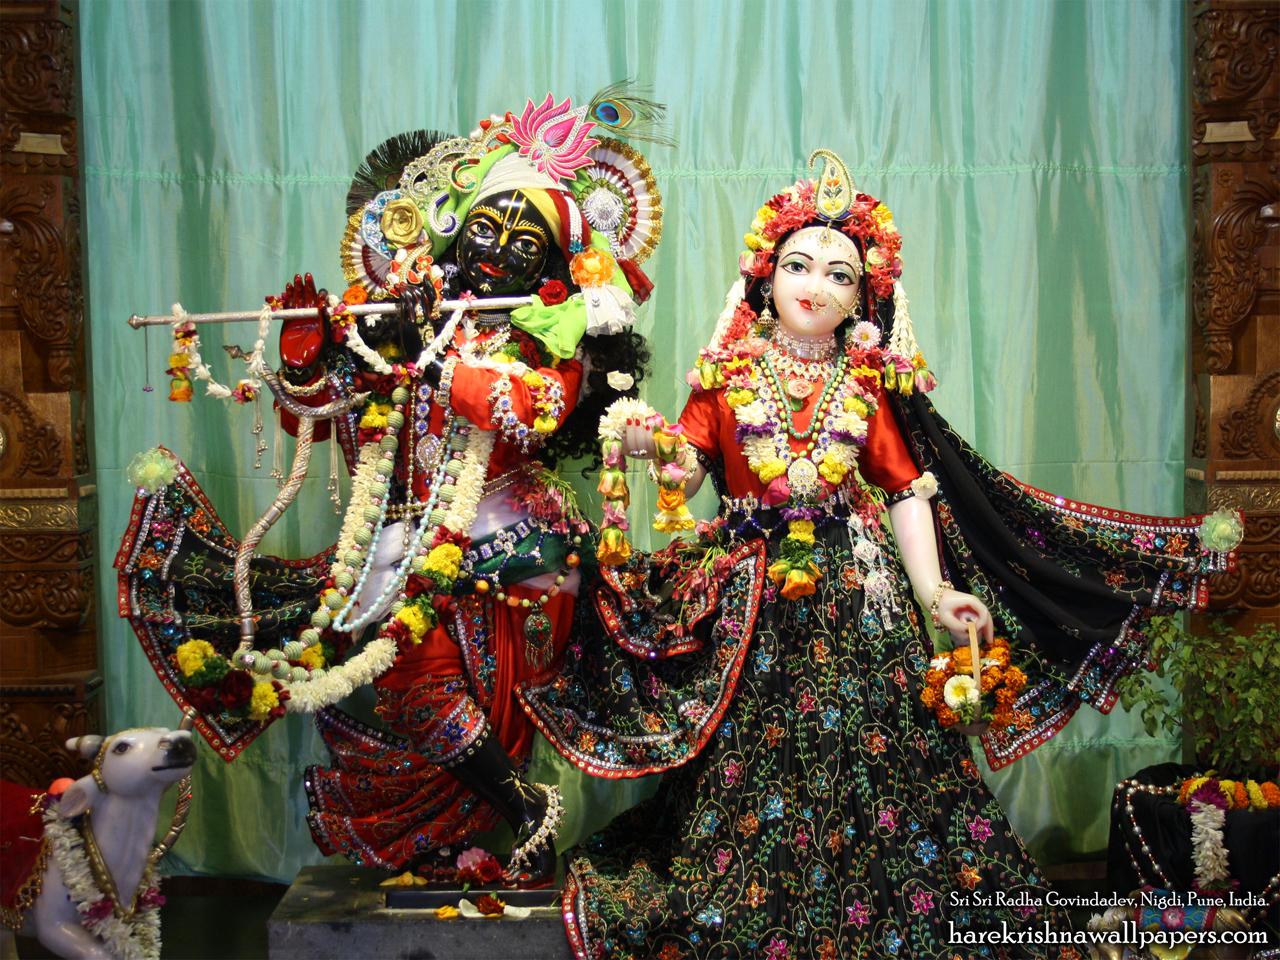 Sri Sri Radha Govind Wallpaper (024) Size 1280x960 Download